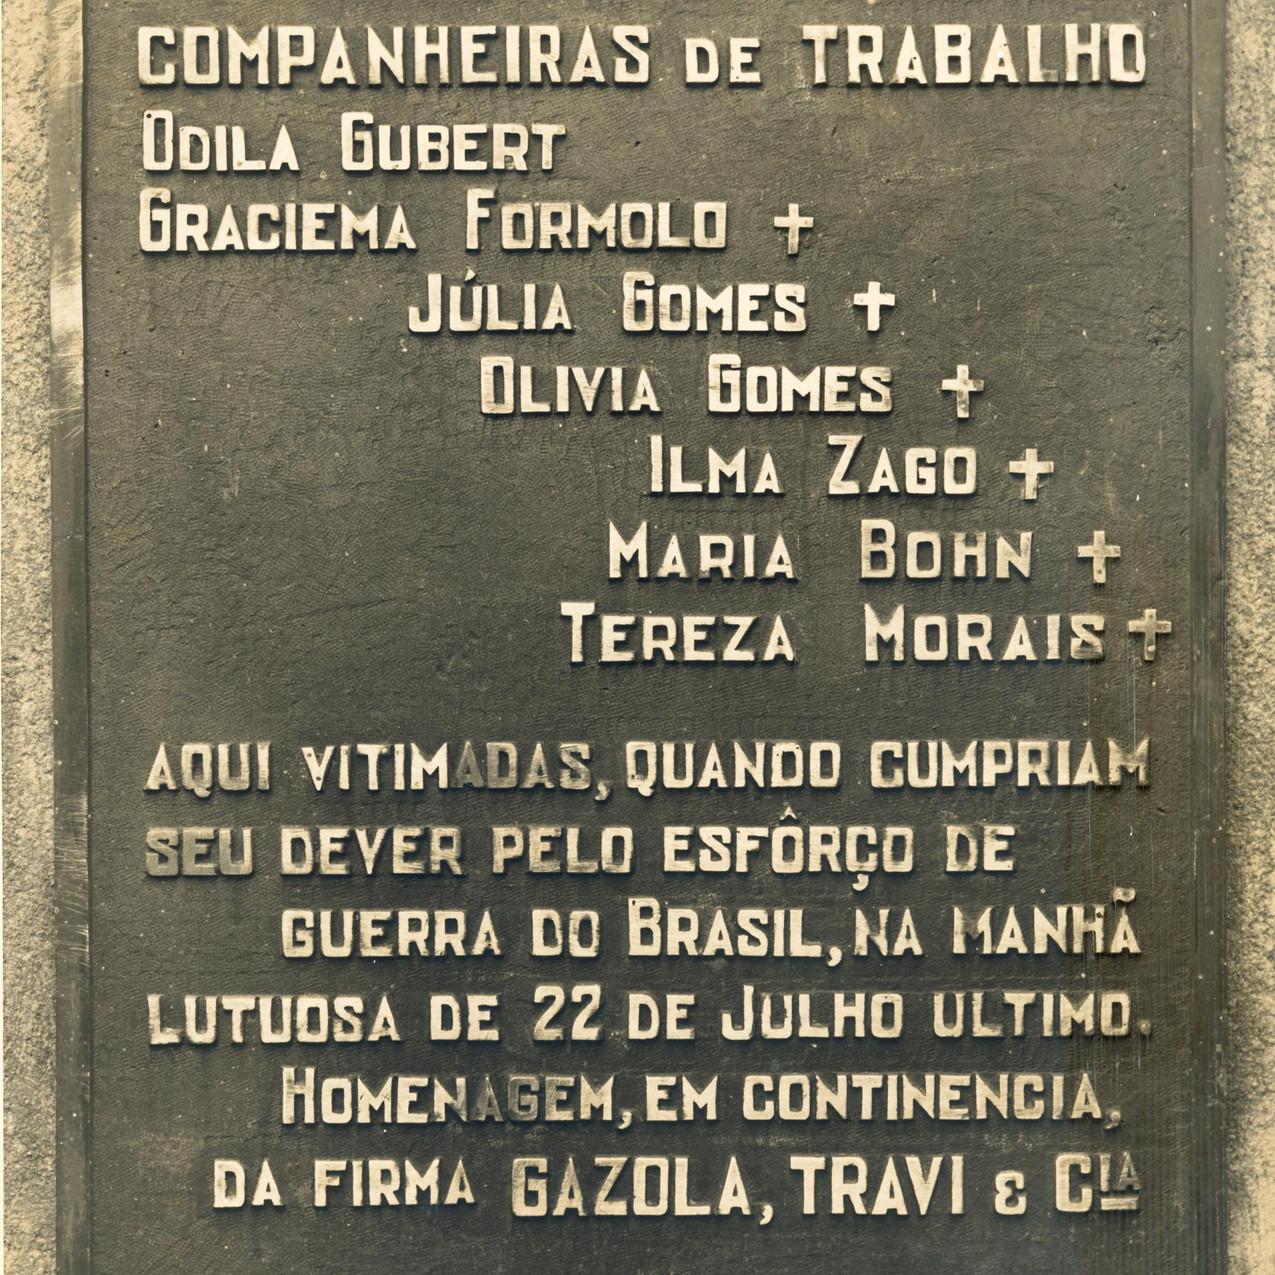 Memorial Gazola